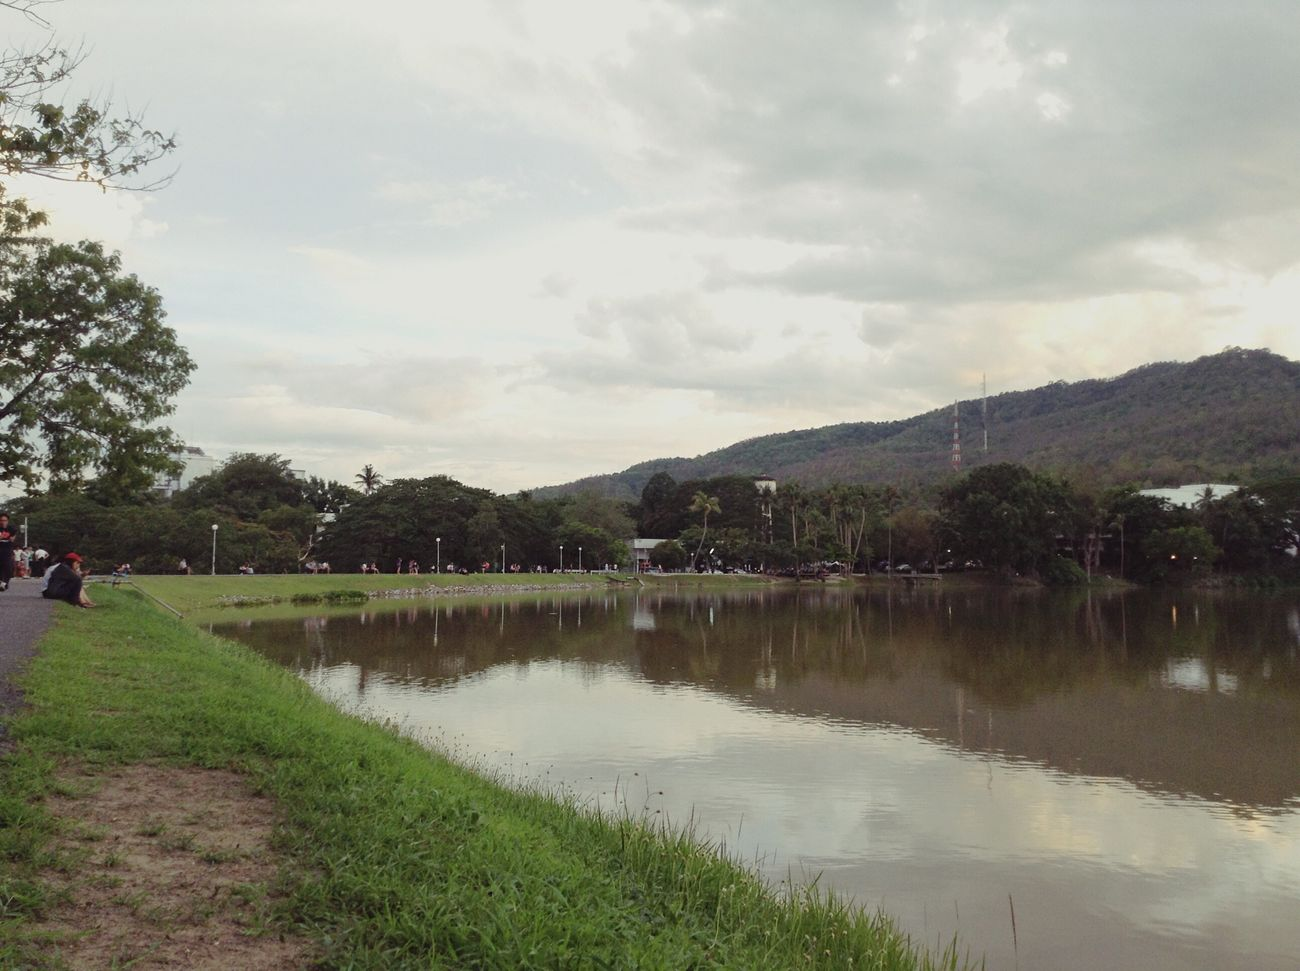 Ang keaw Relaxing CMU Lake Chiang Mai | Thailand